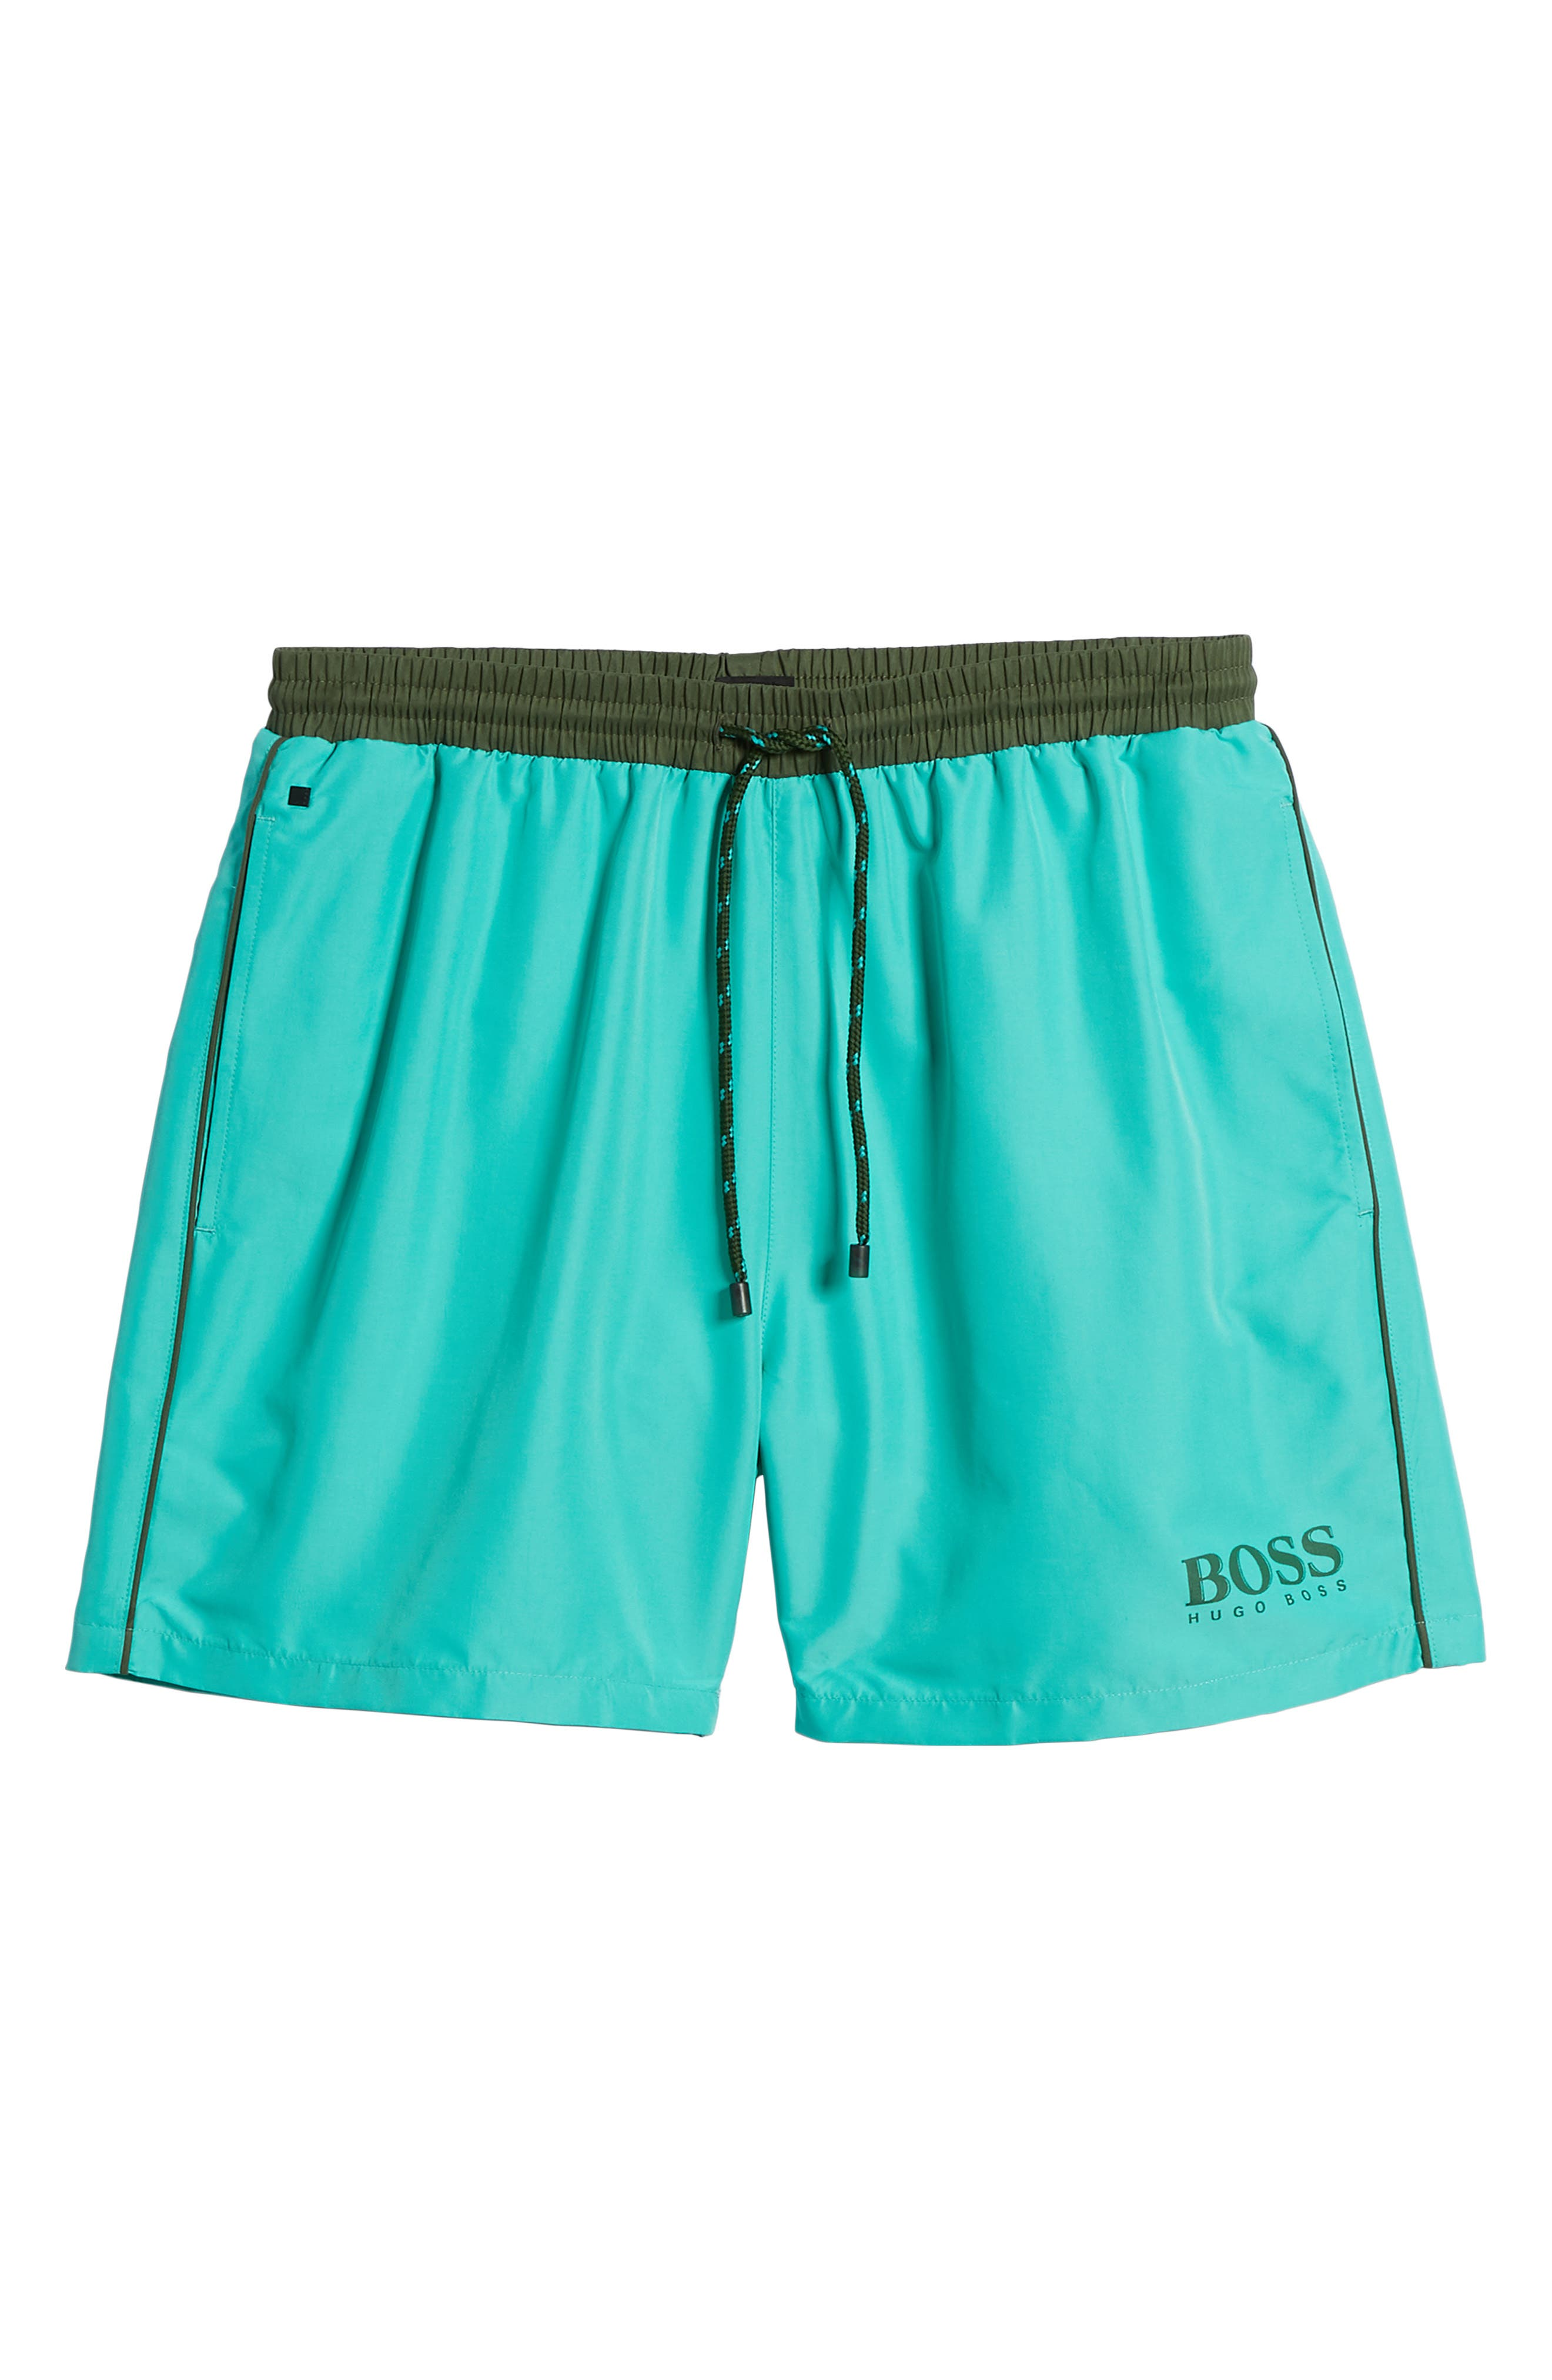 Starfish Swim Trunks,                             Alternate thumbnail 6, color,                             Green